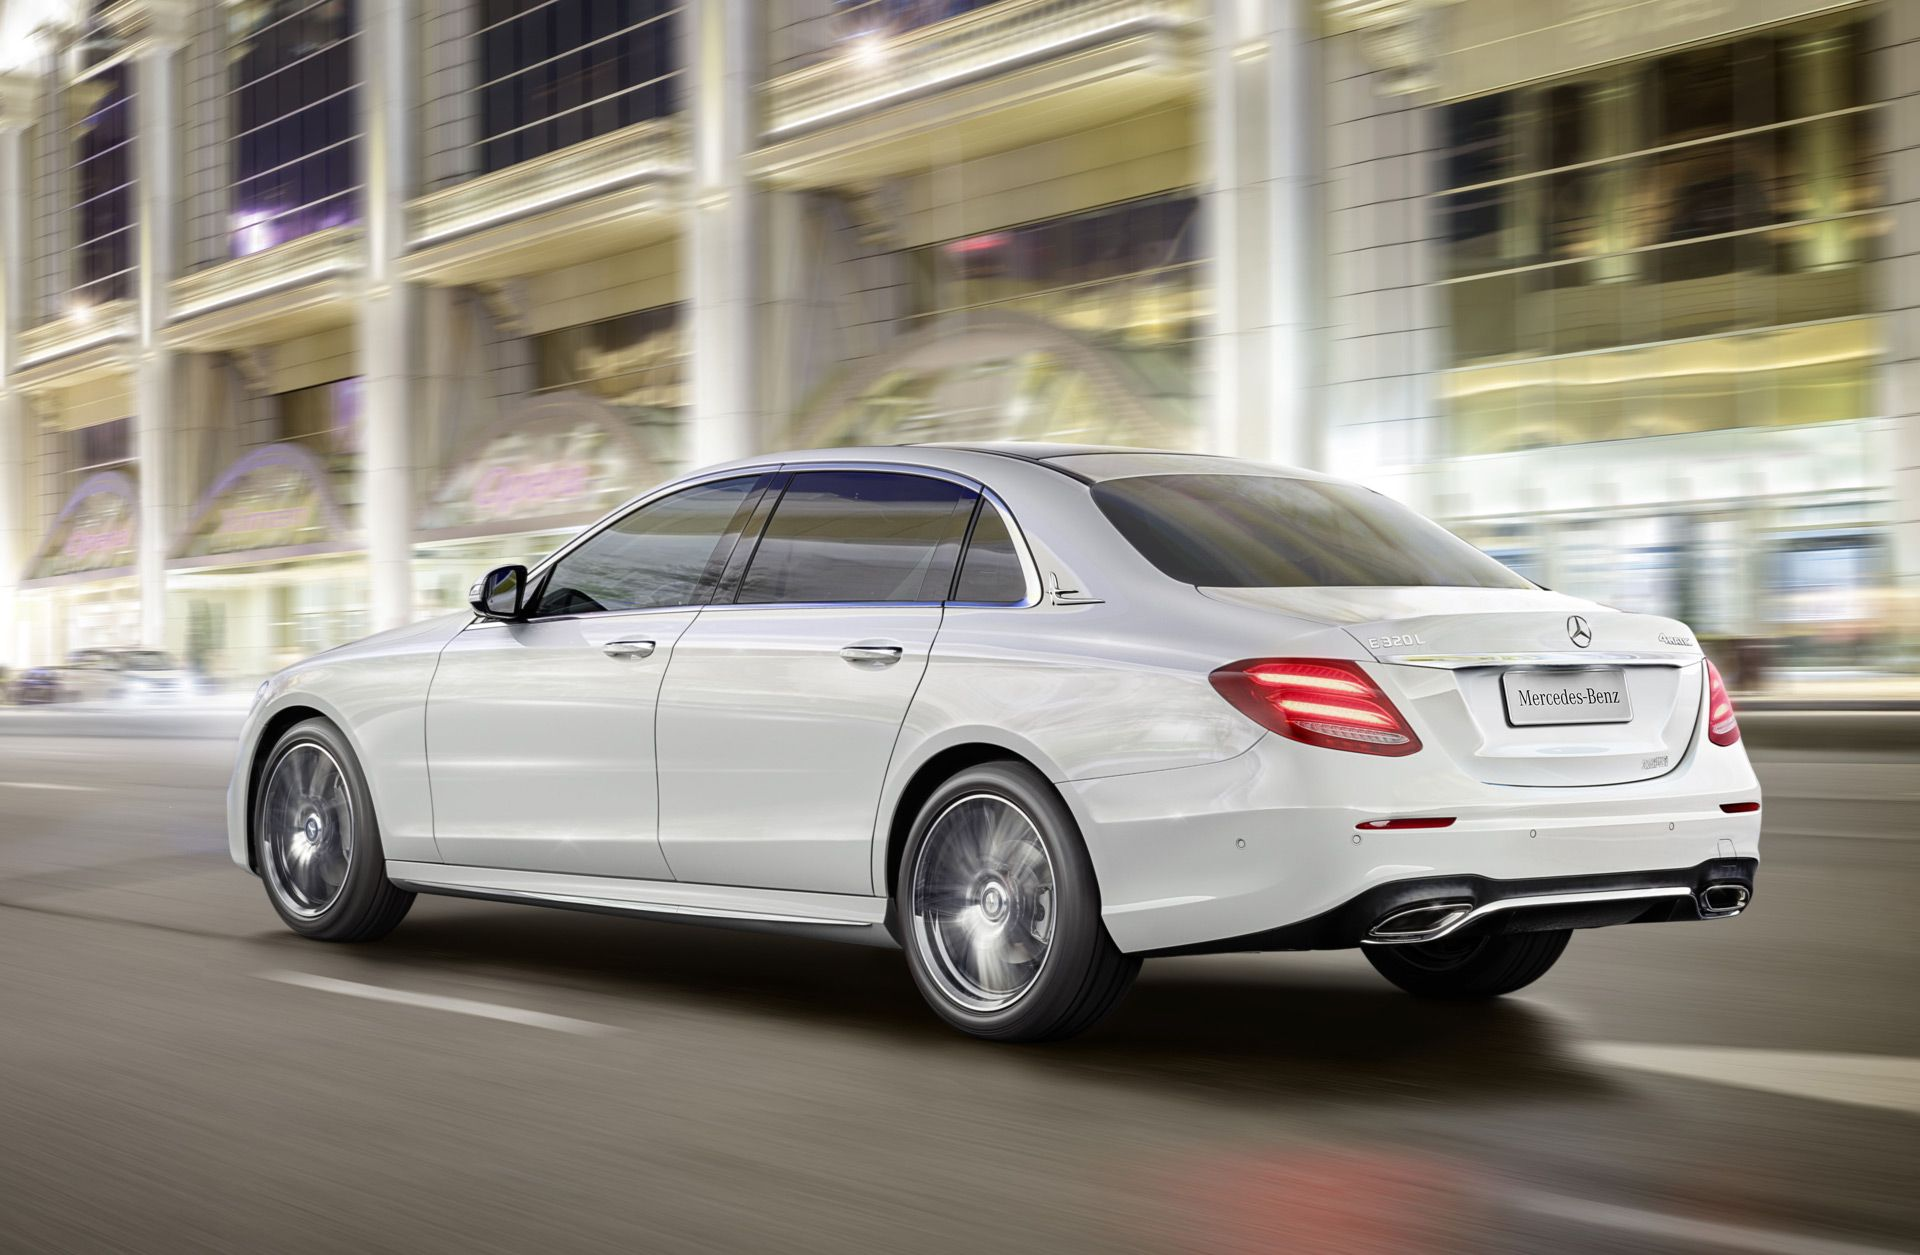 Long Wheelbase Mercedes Benz E Class Launches In China Benz E Class Benz Benz E